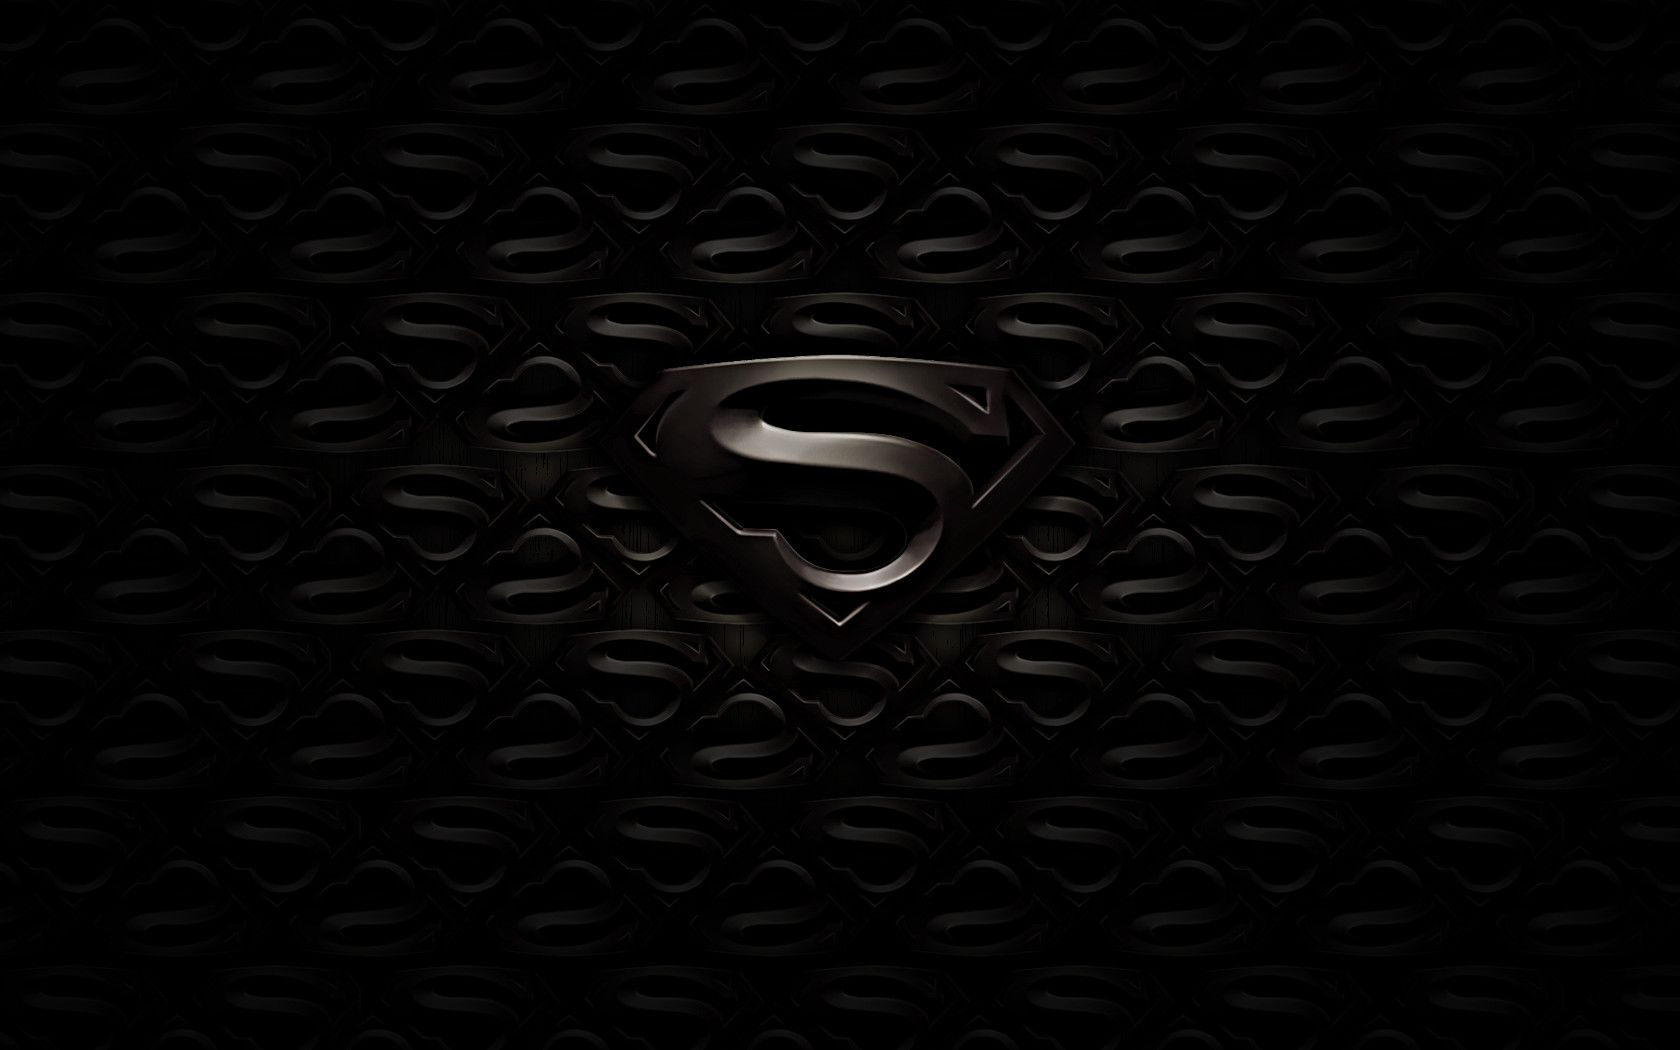 superman logo desktop wallpaper sf wallpaper